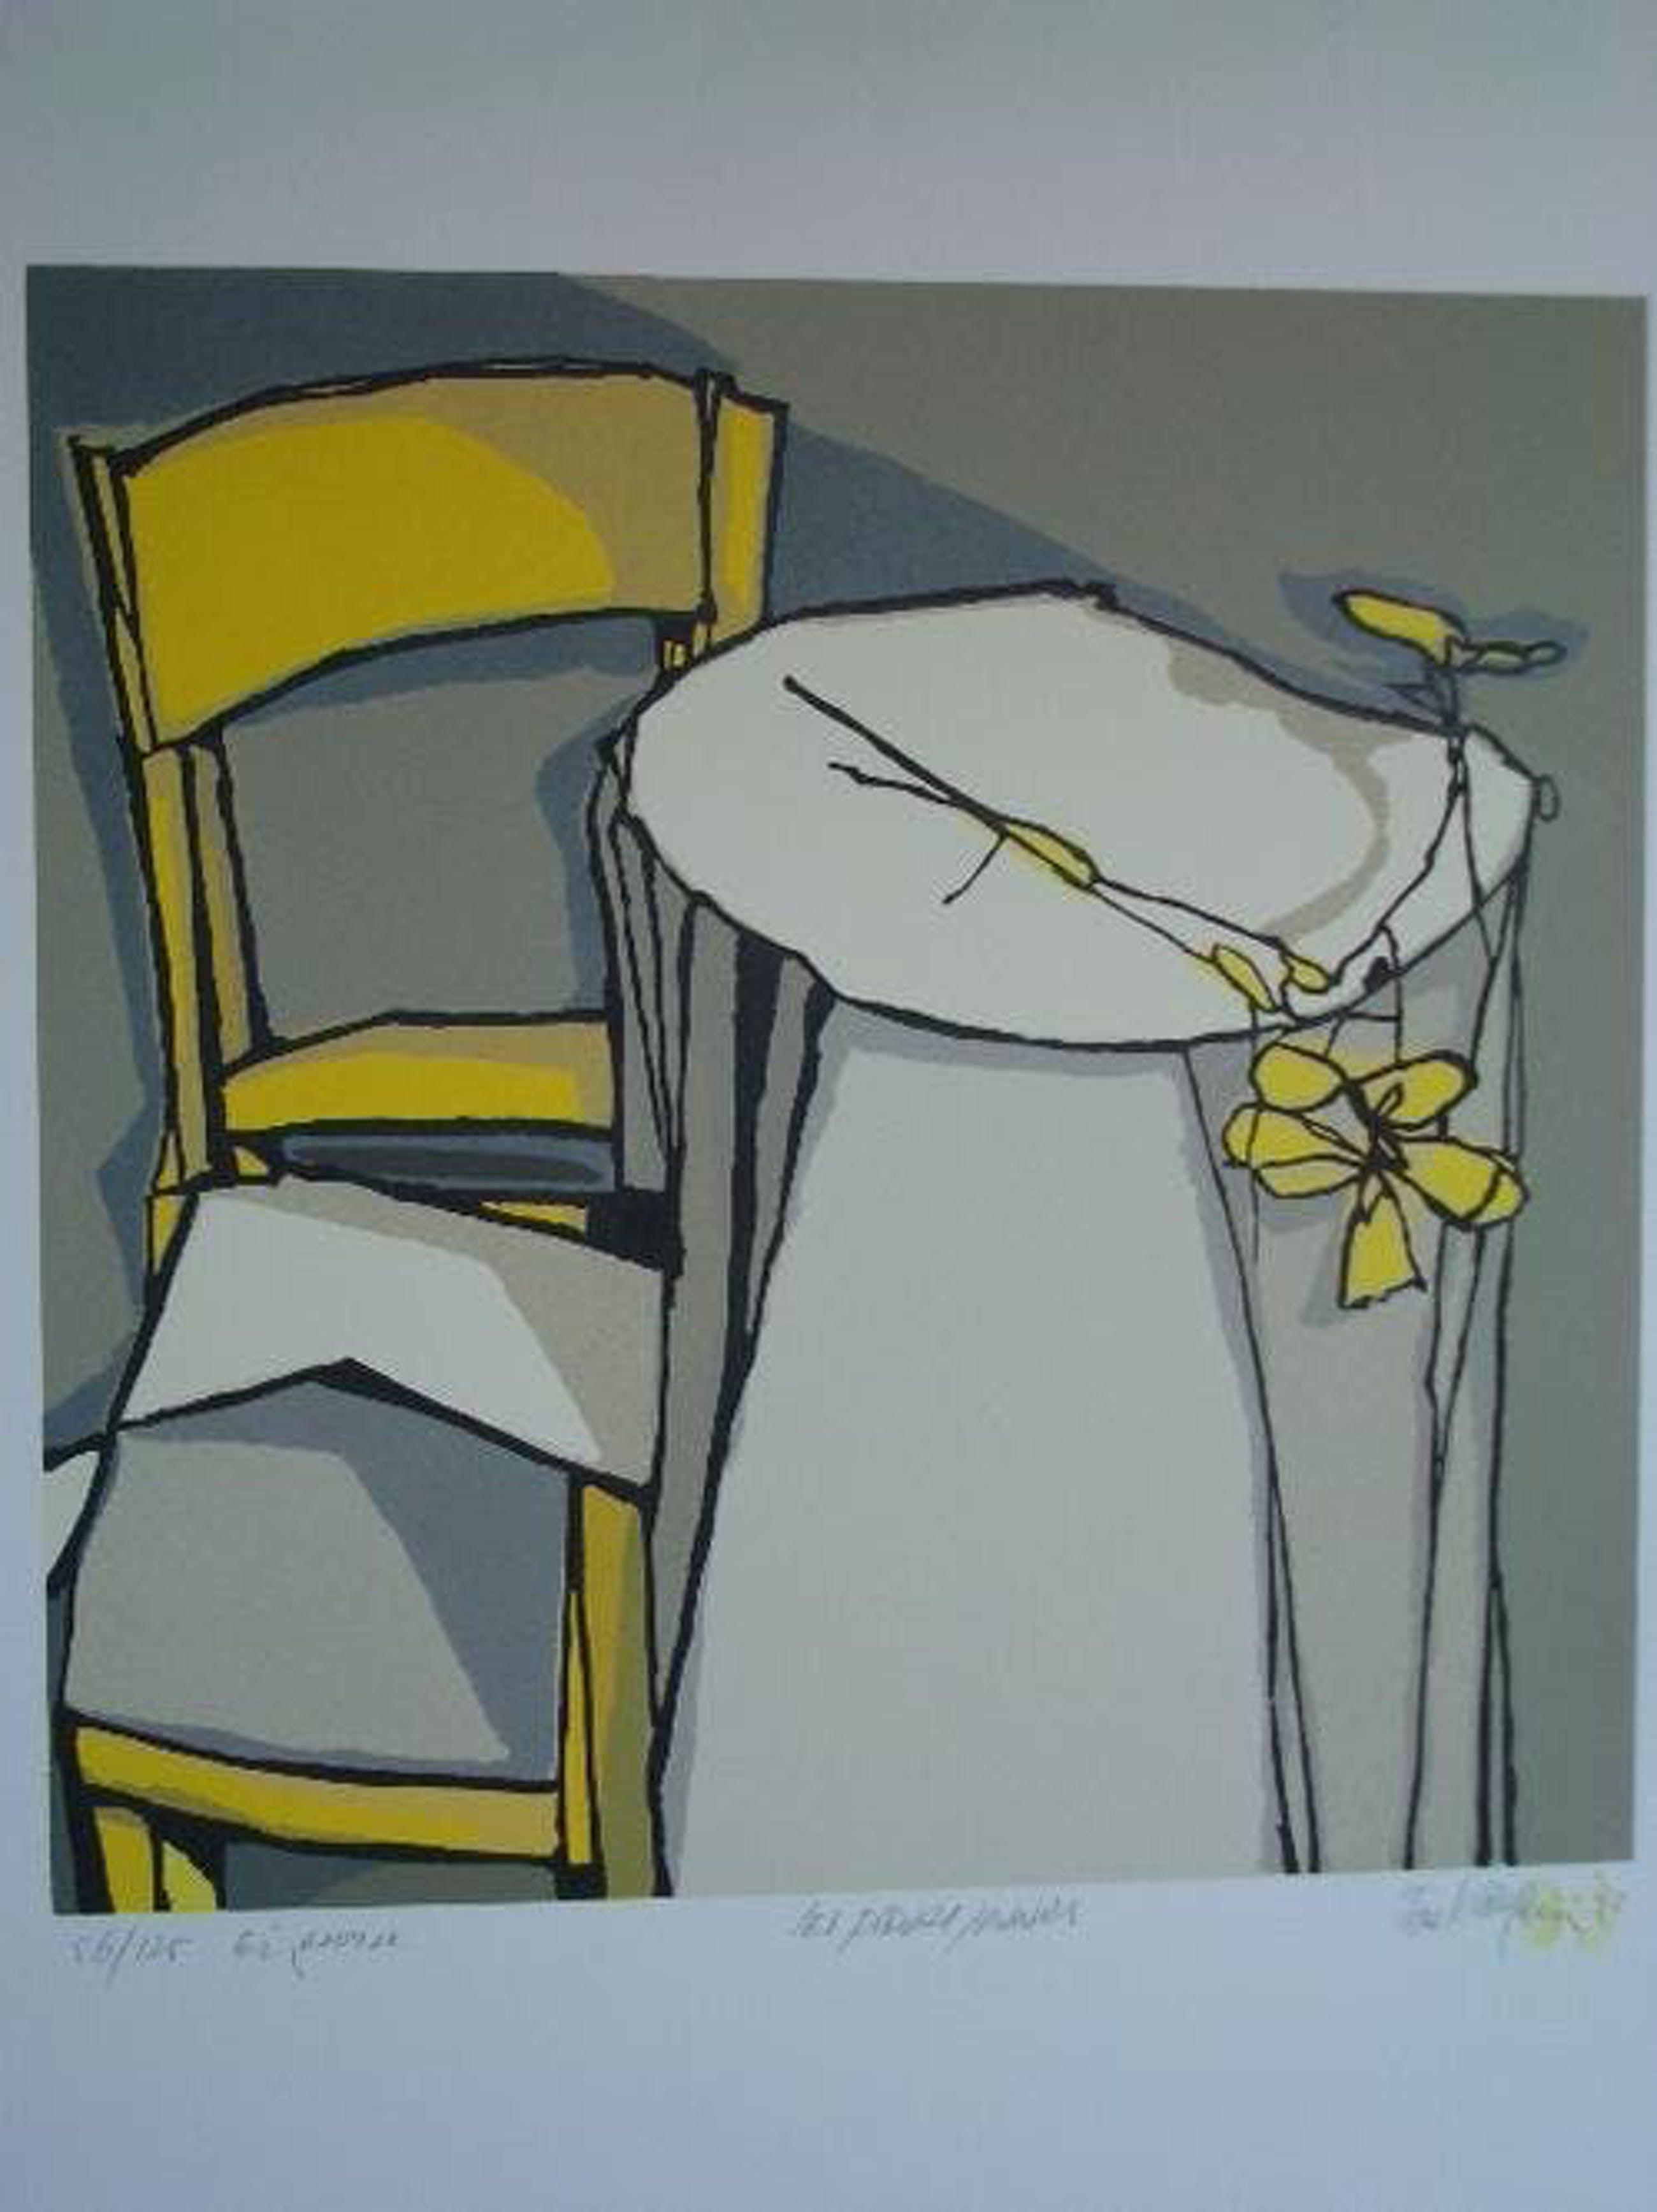 Fon Klement - Les fleures jaunes, Holzdruck 1993 kopen? Bied vanaf 180!